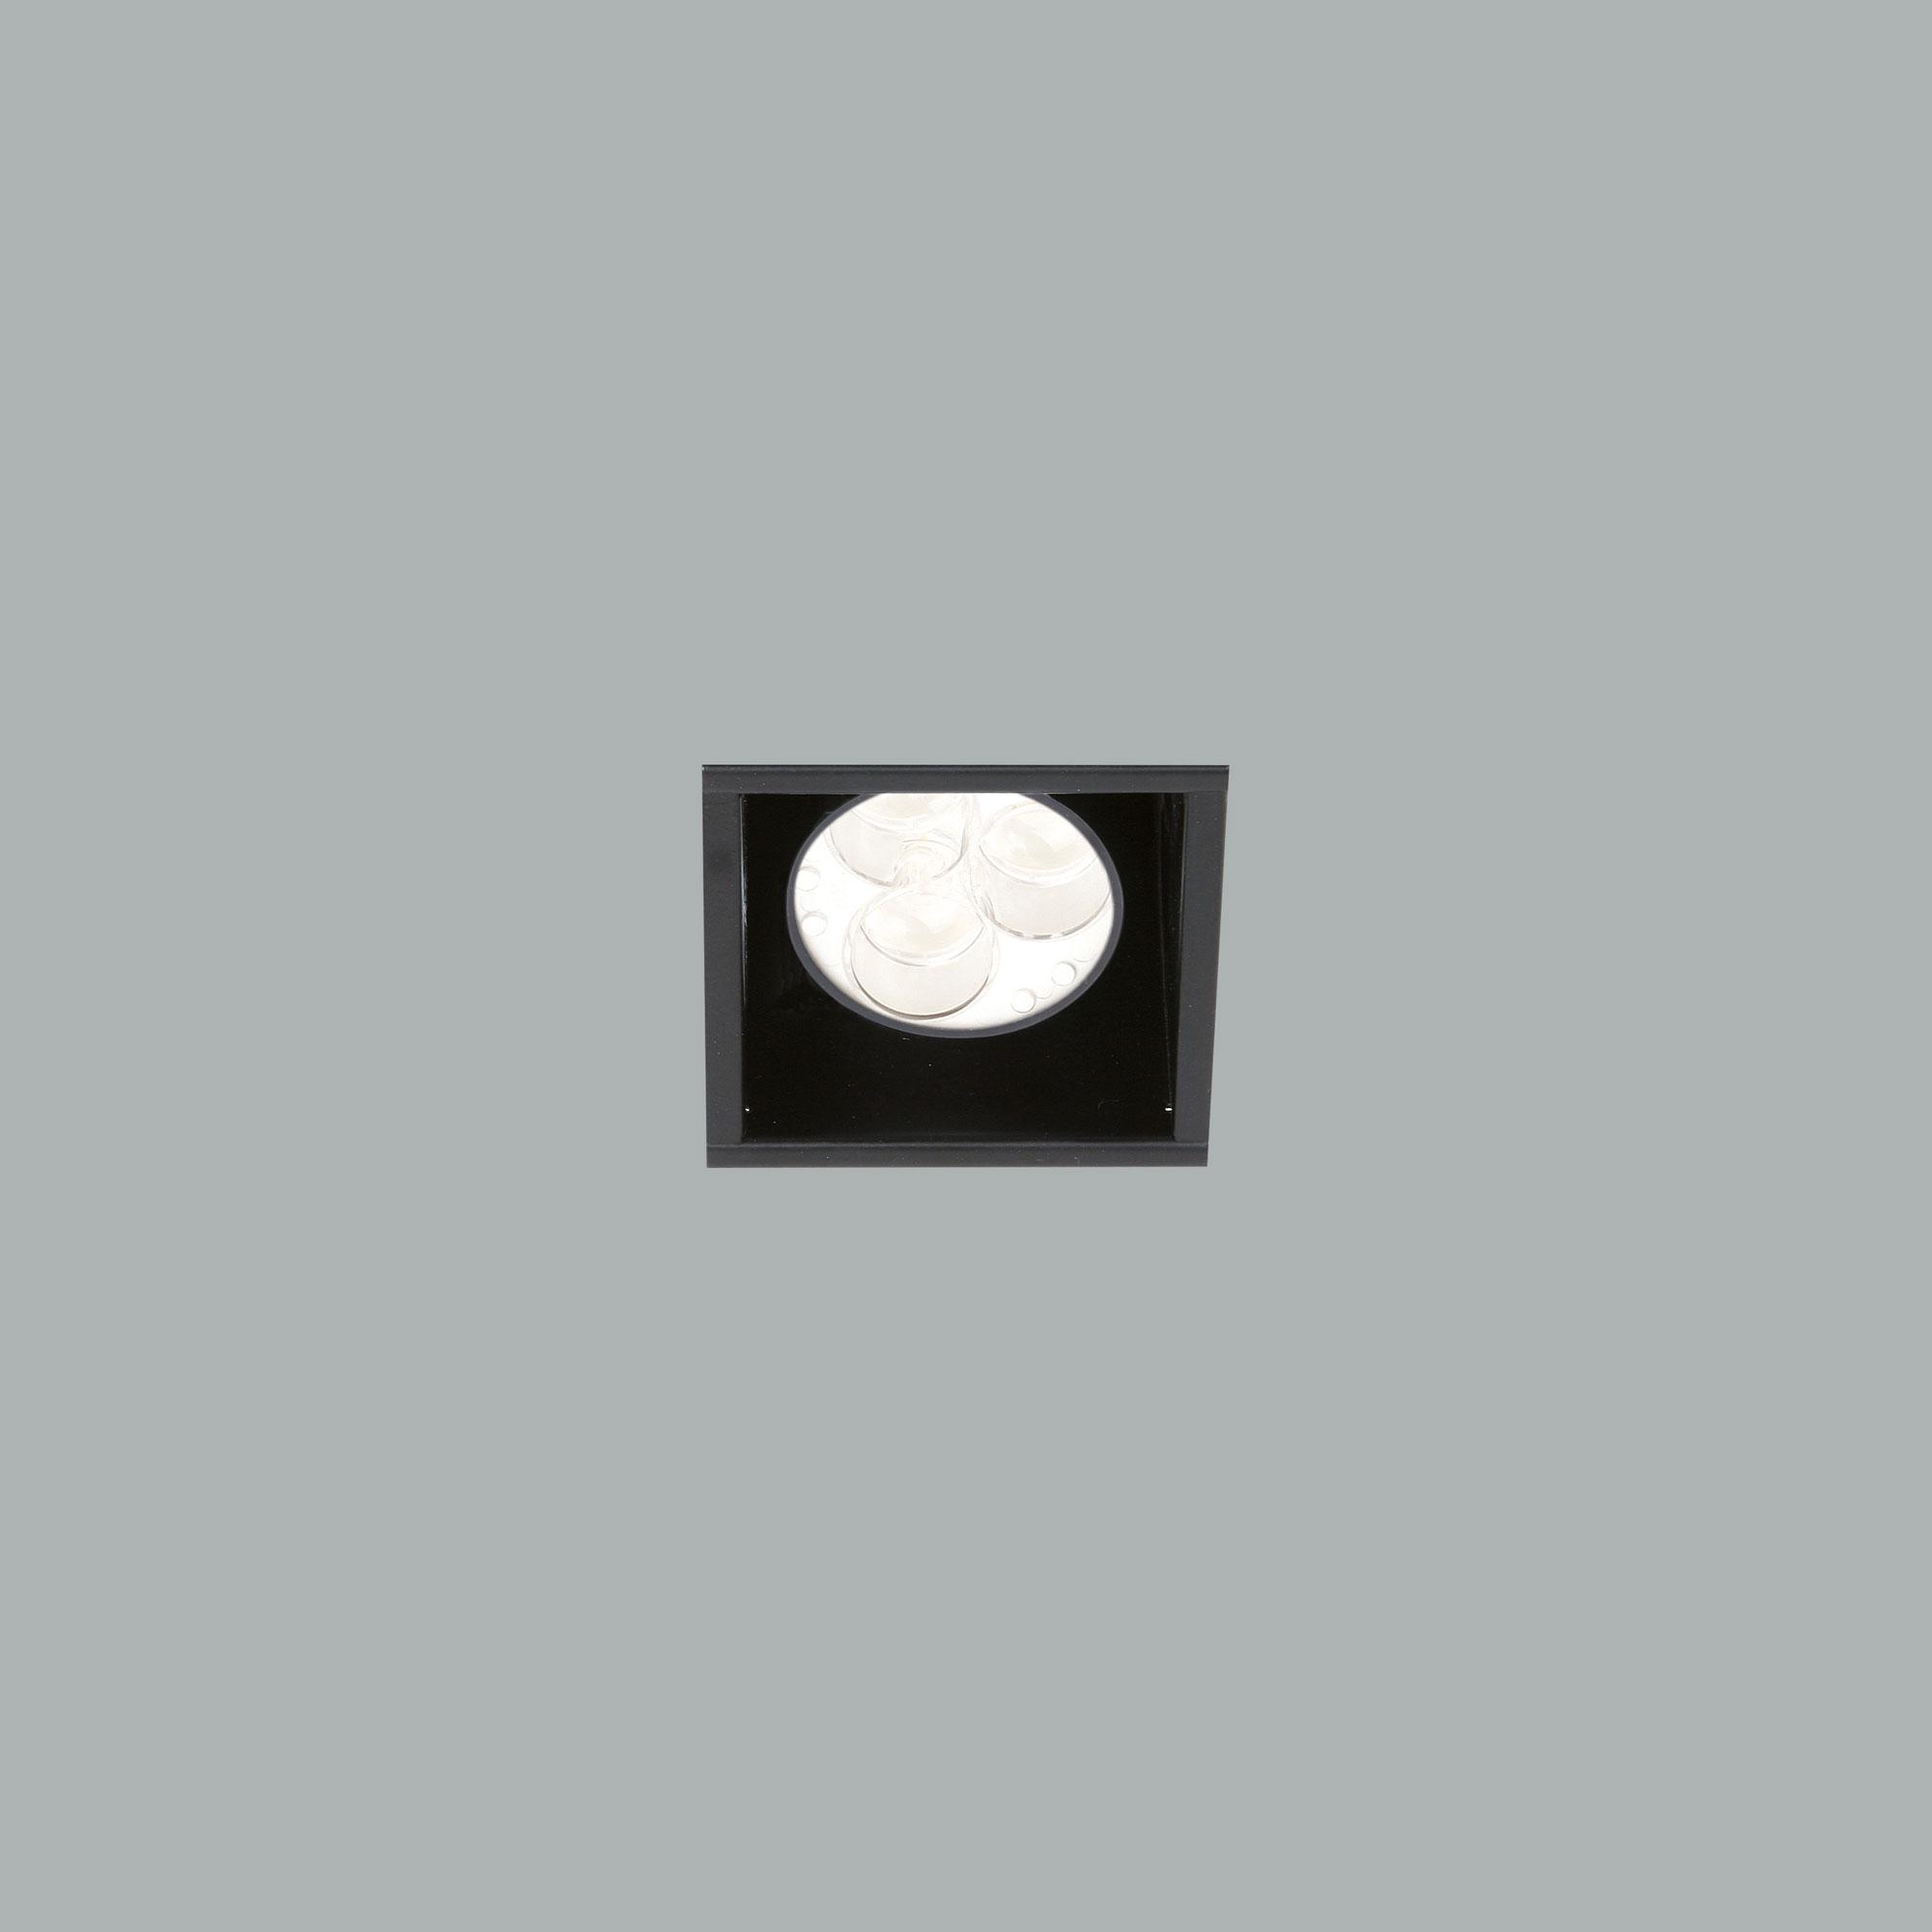 I02.PLR.95001_1